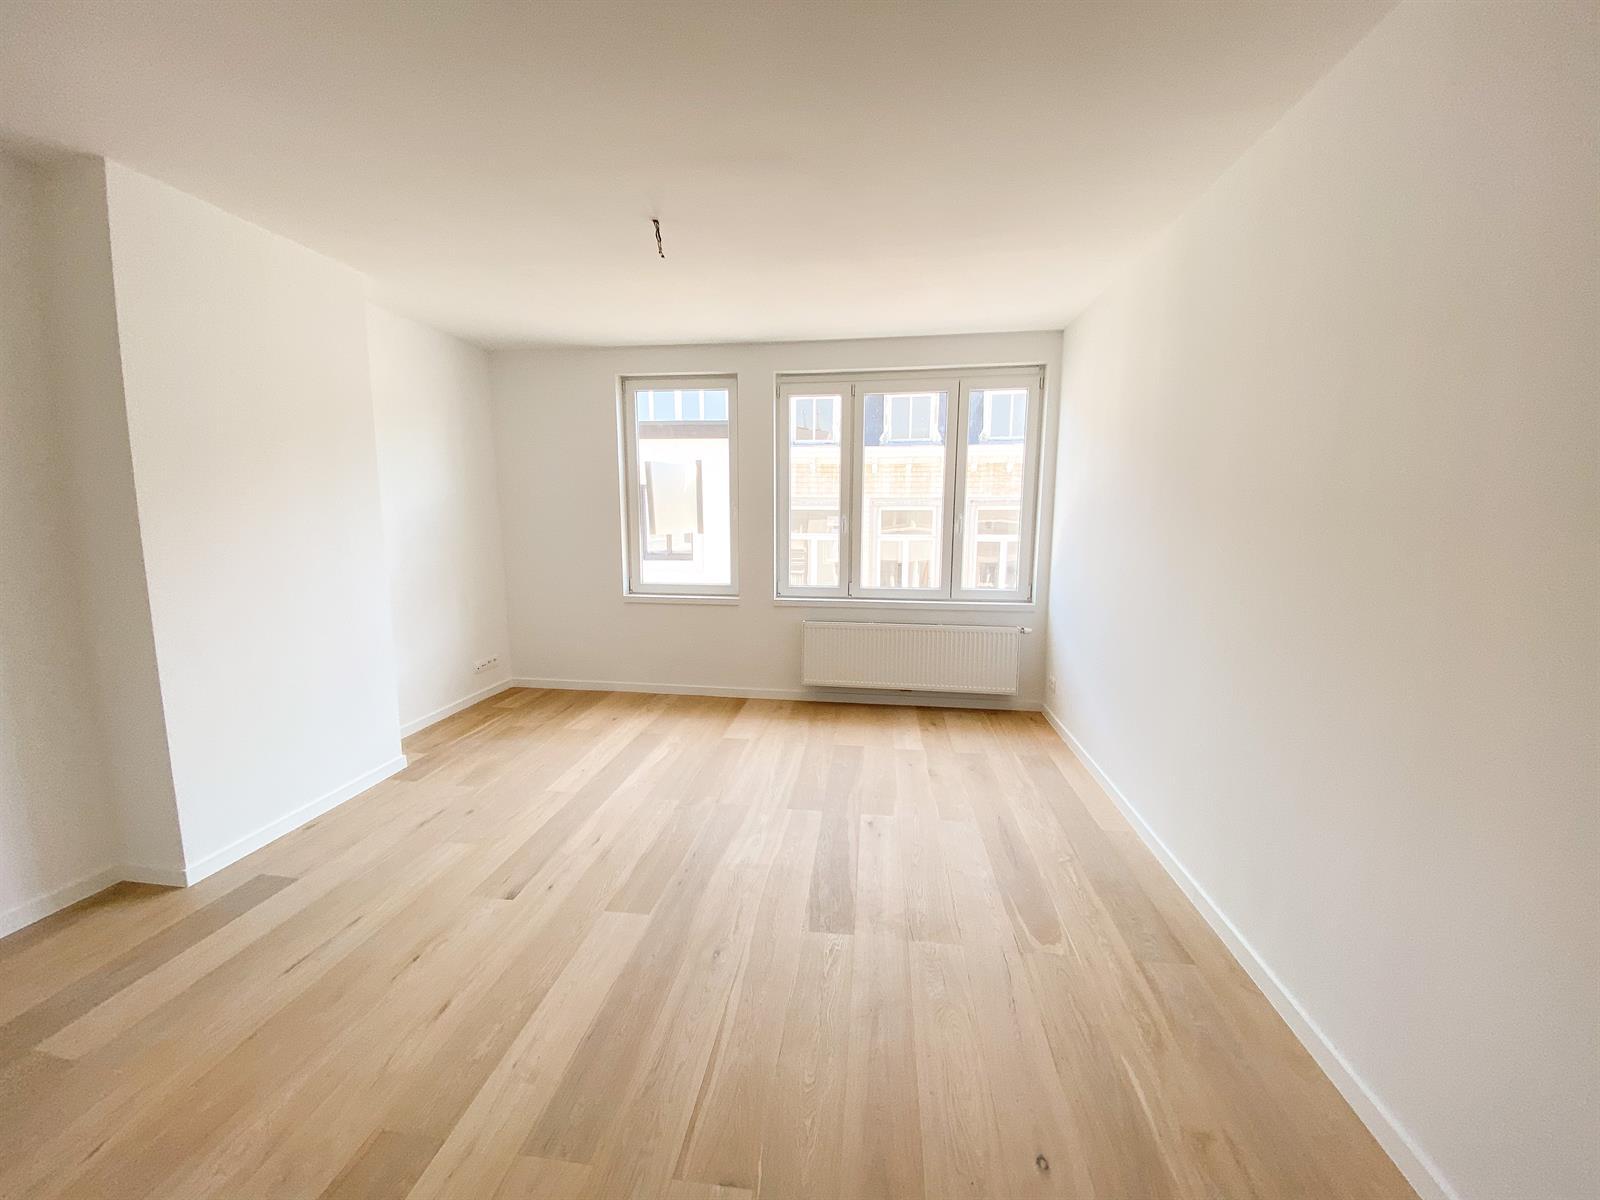 Appartement - Liège - #4045833-17